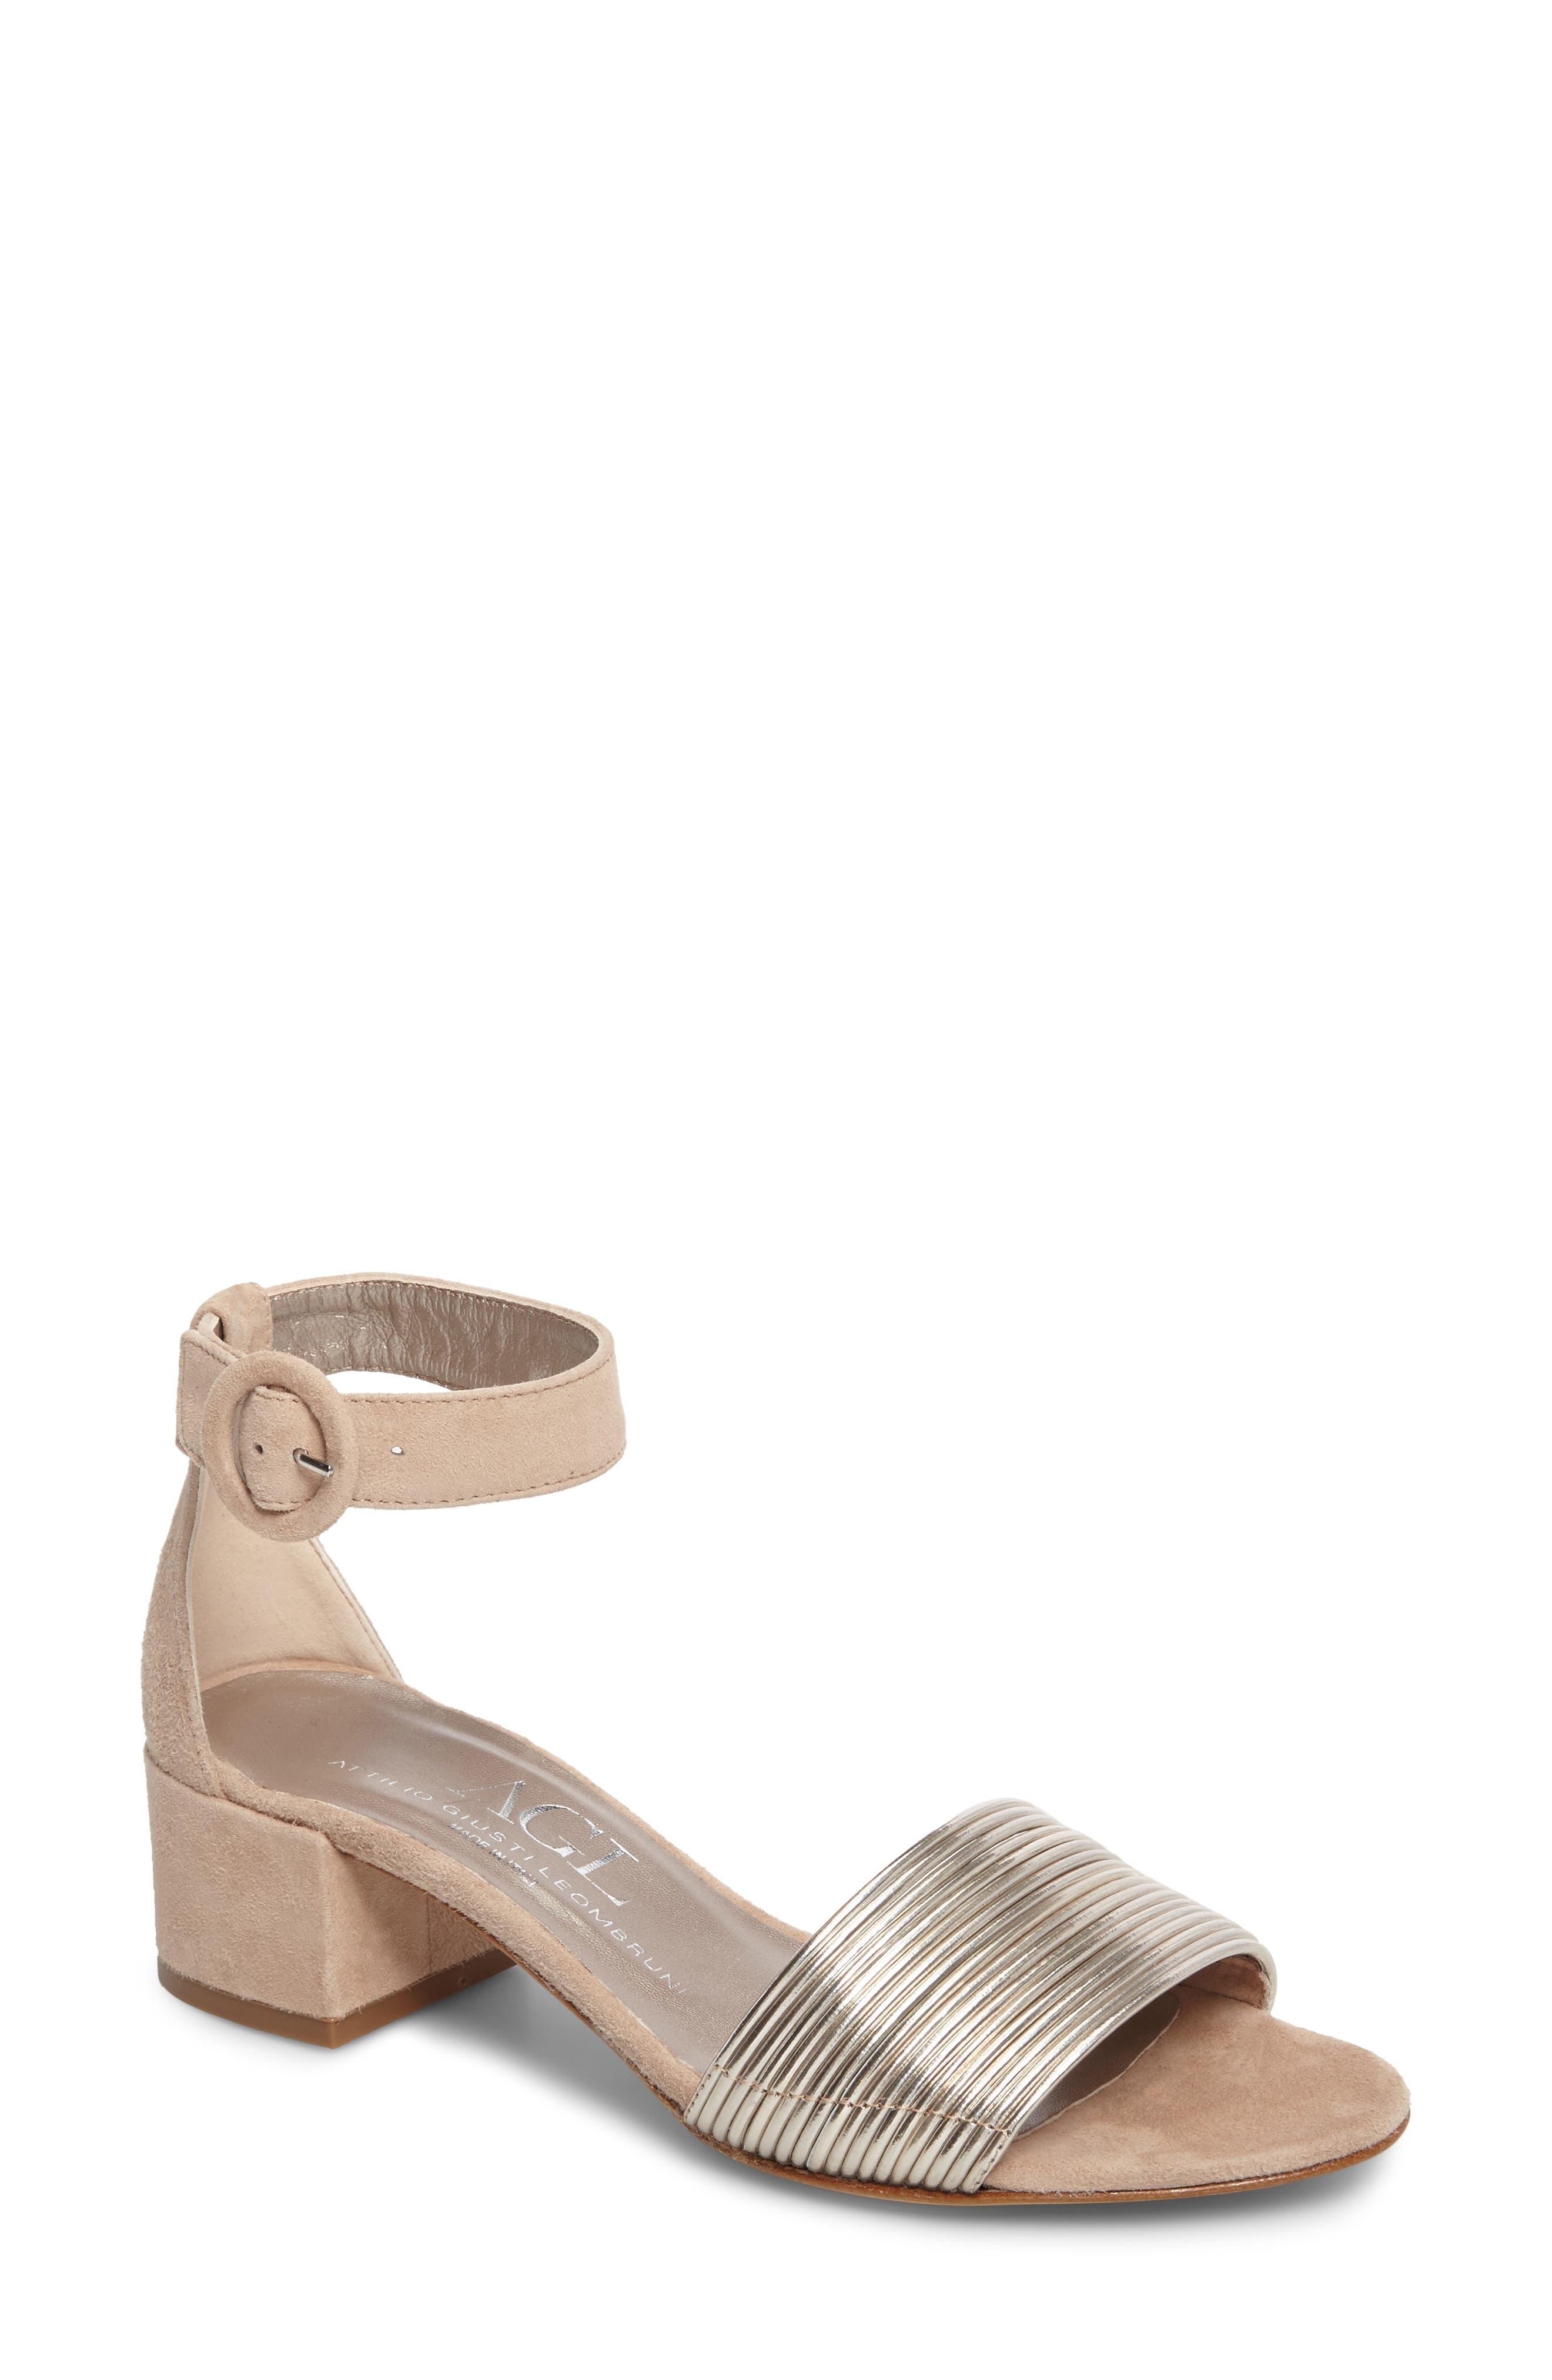 Ankle Strap Sandal,                         Main,                         color, Platinum Leather